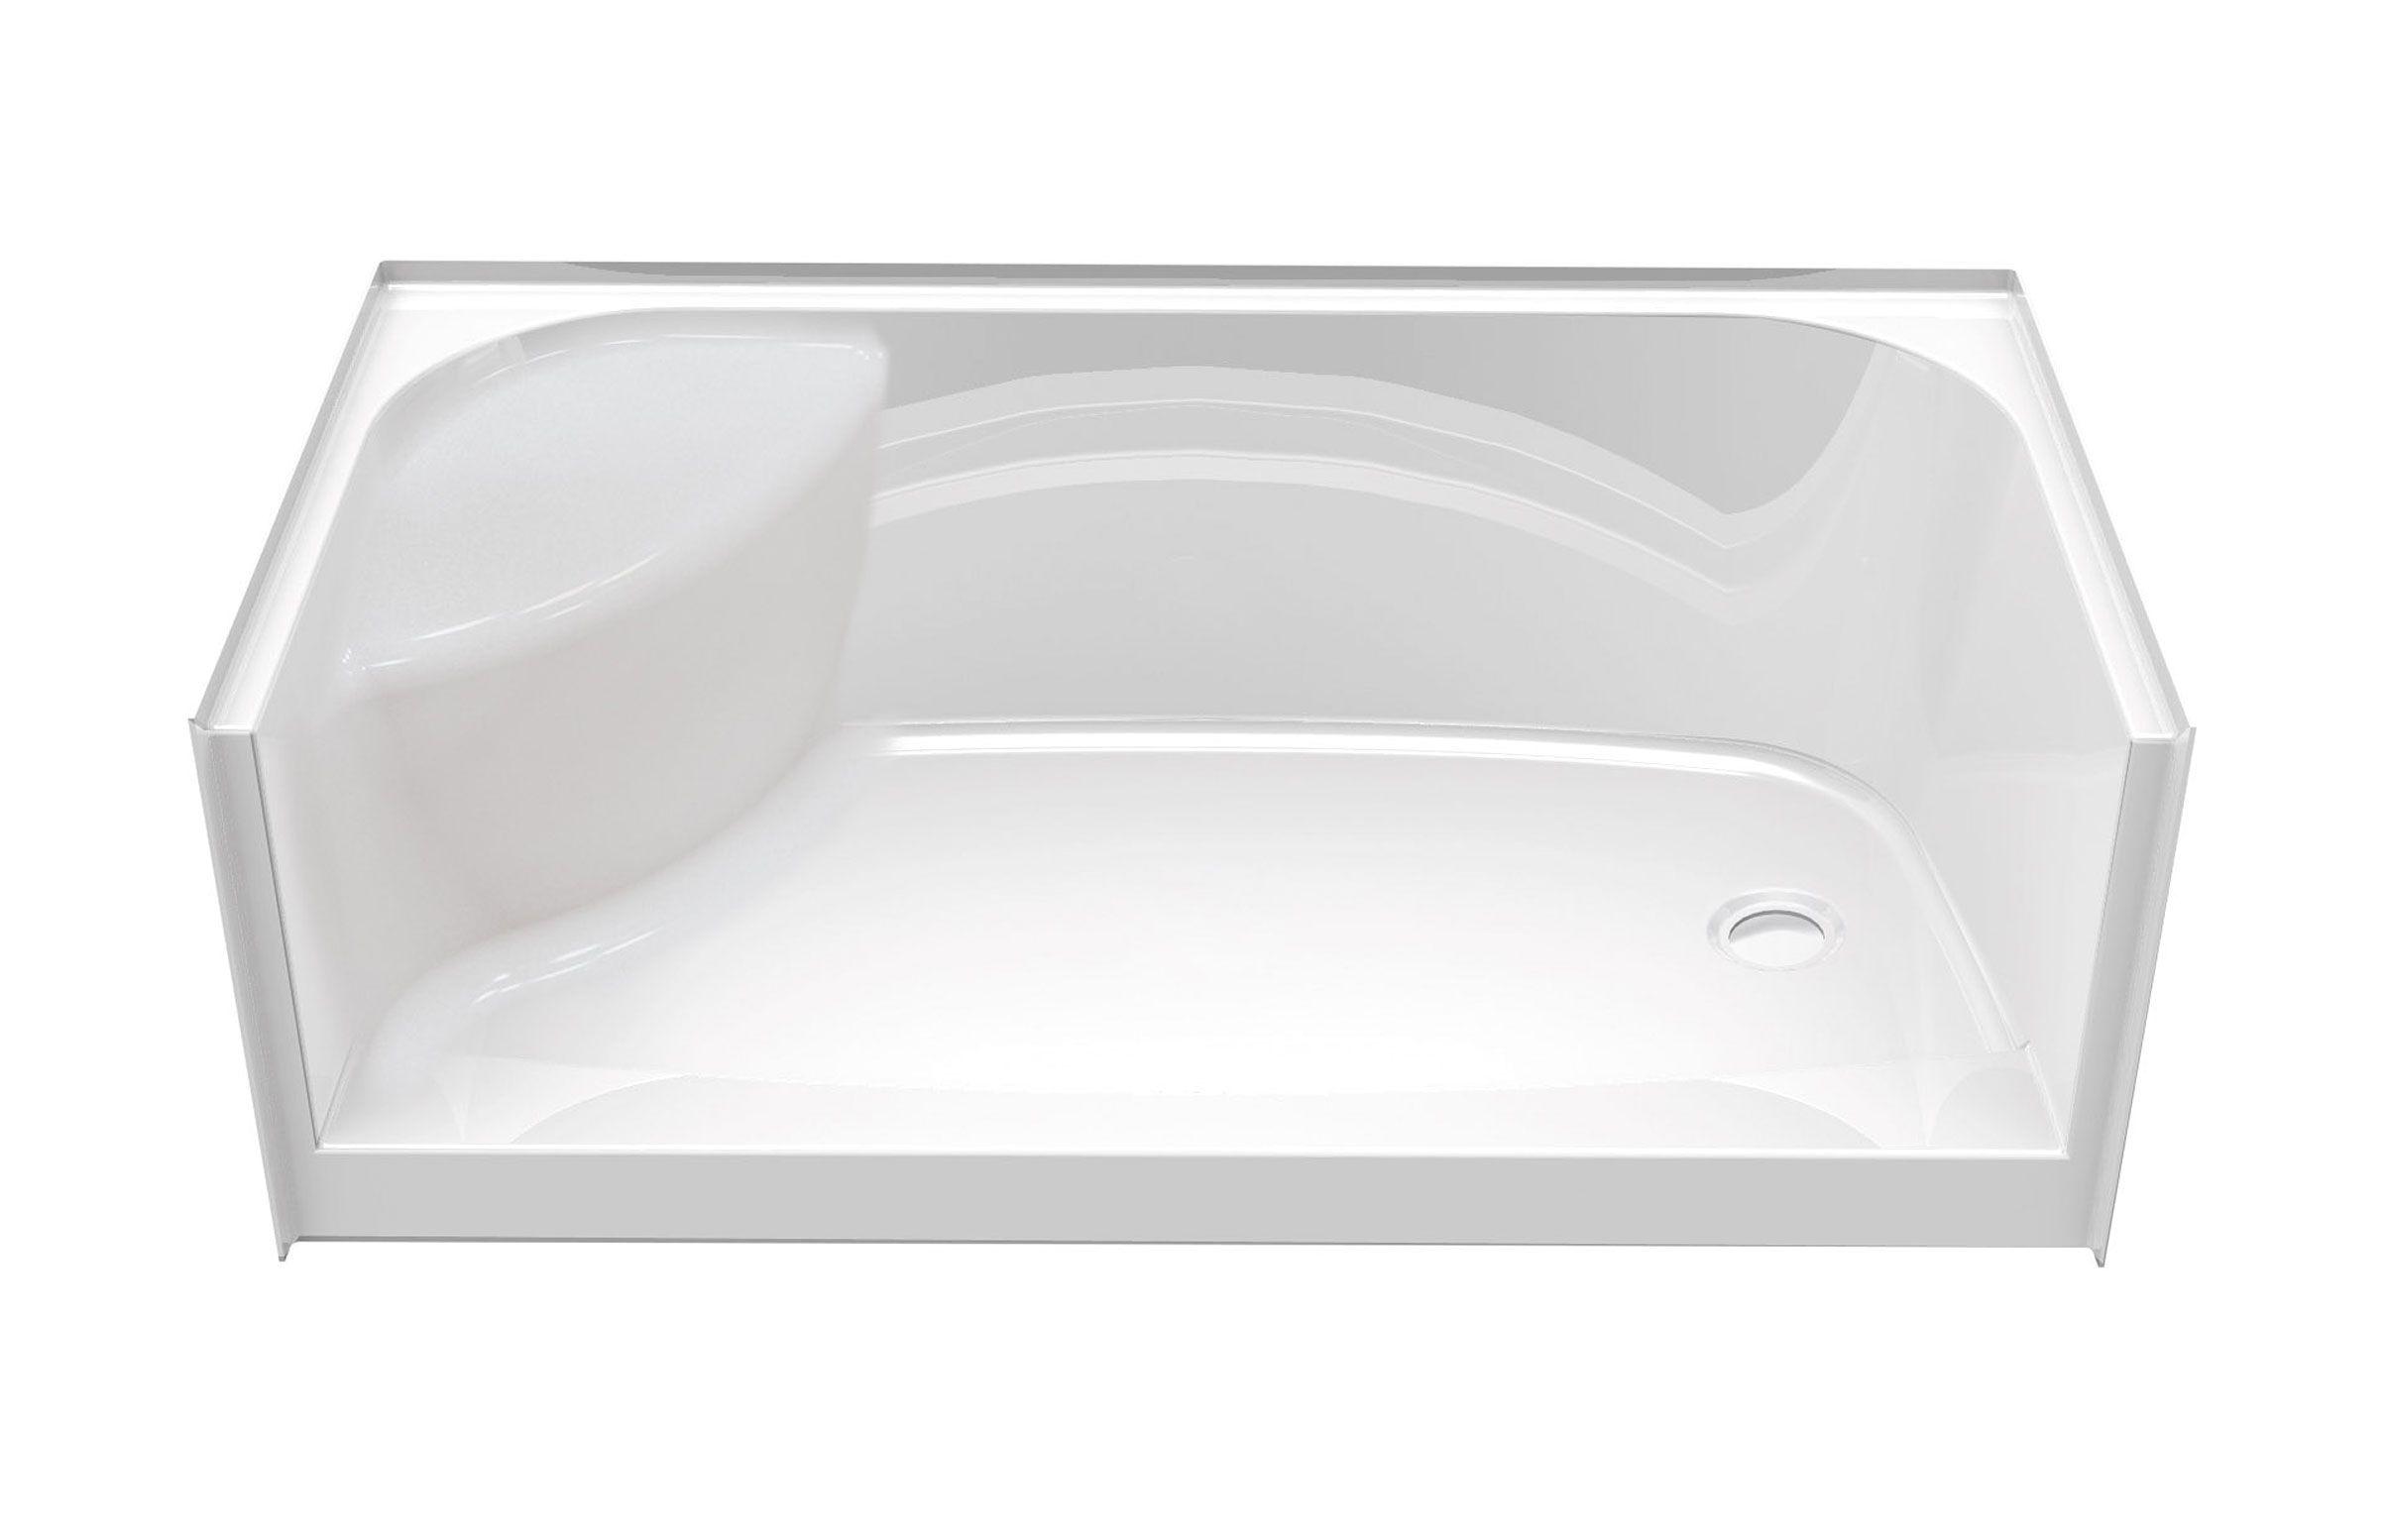 Fiberglass Shower Pan With Bench For Contemporary Bathroom